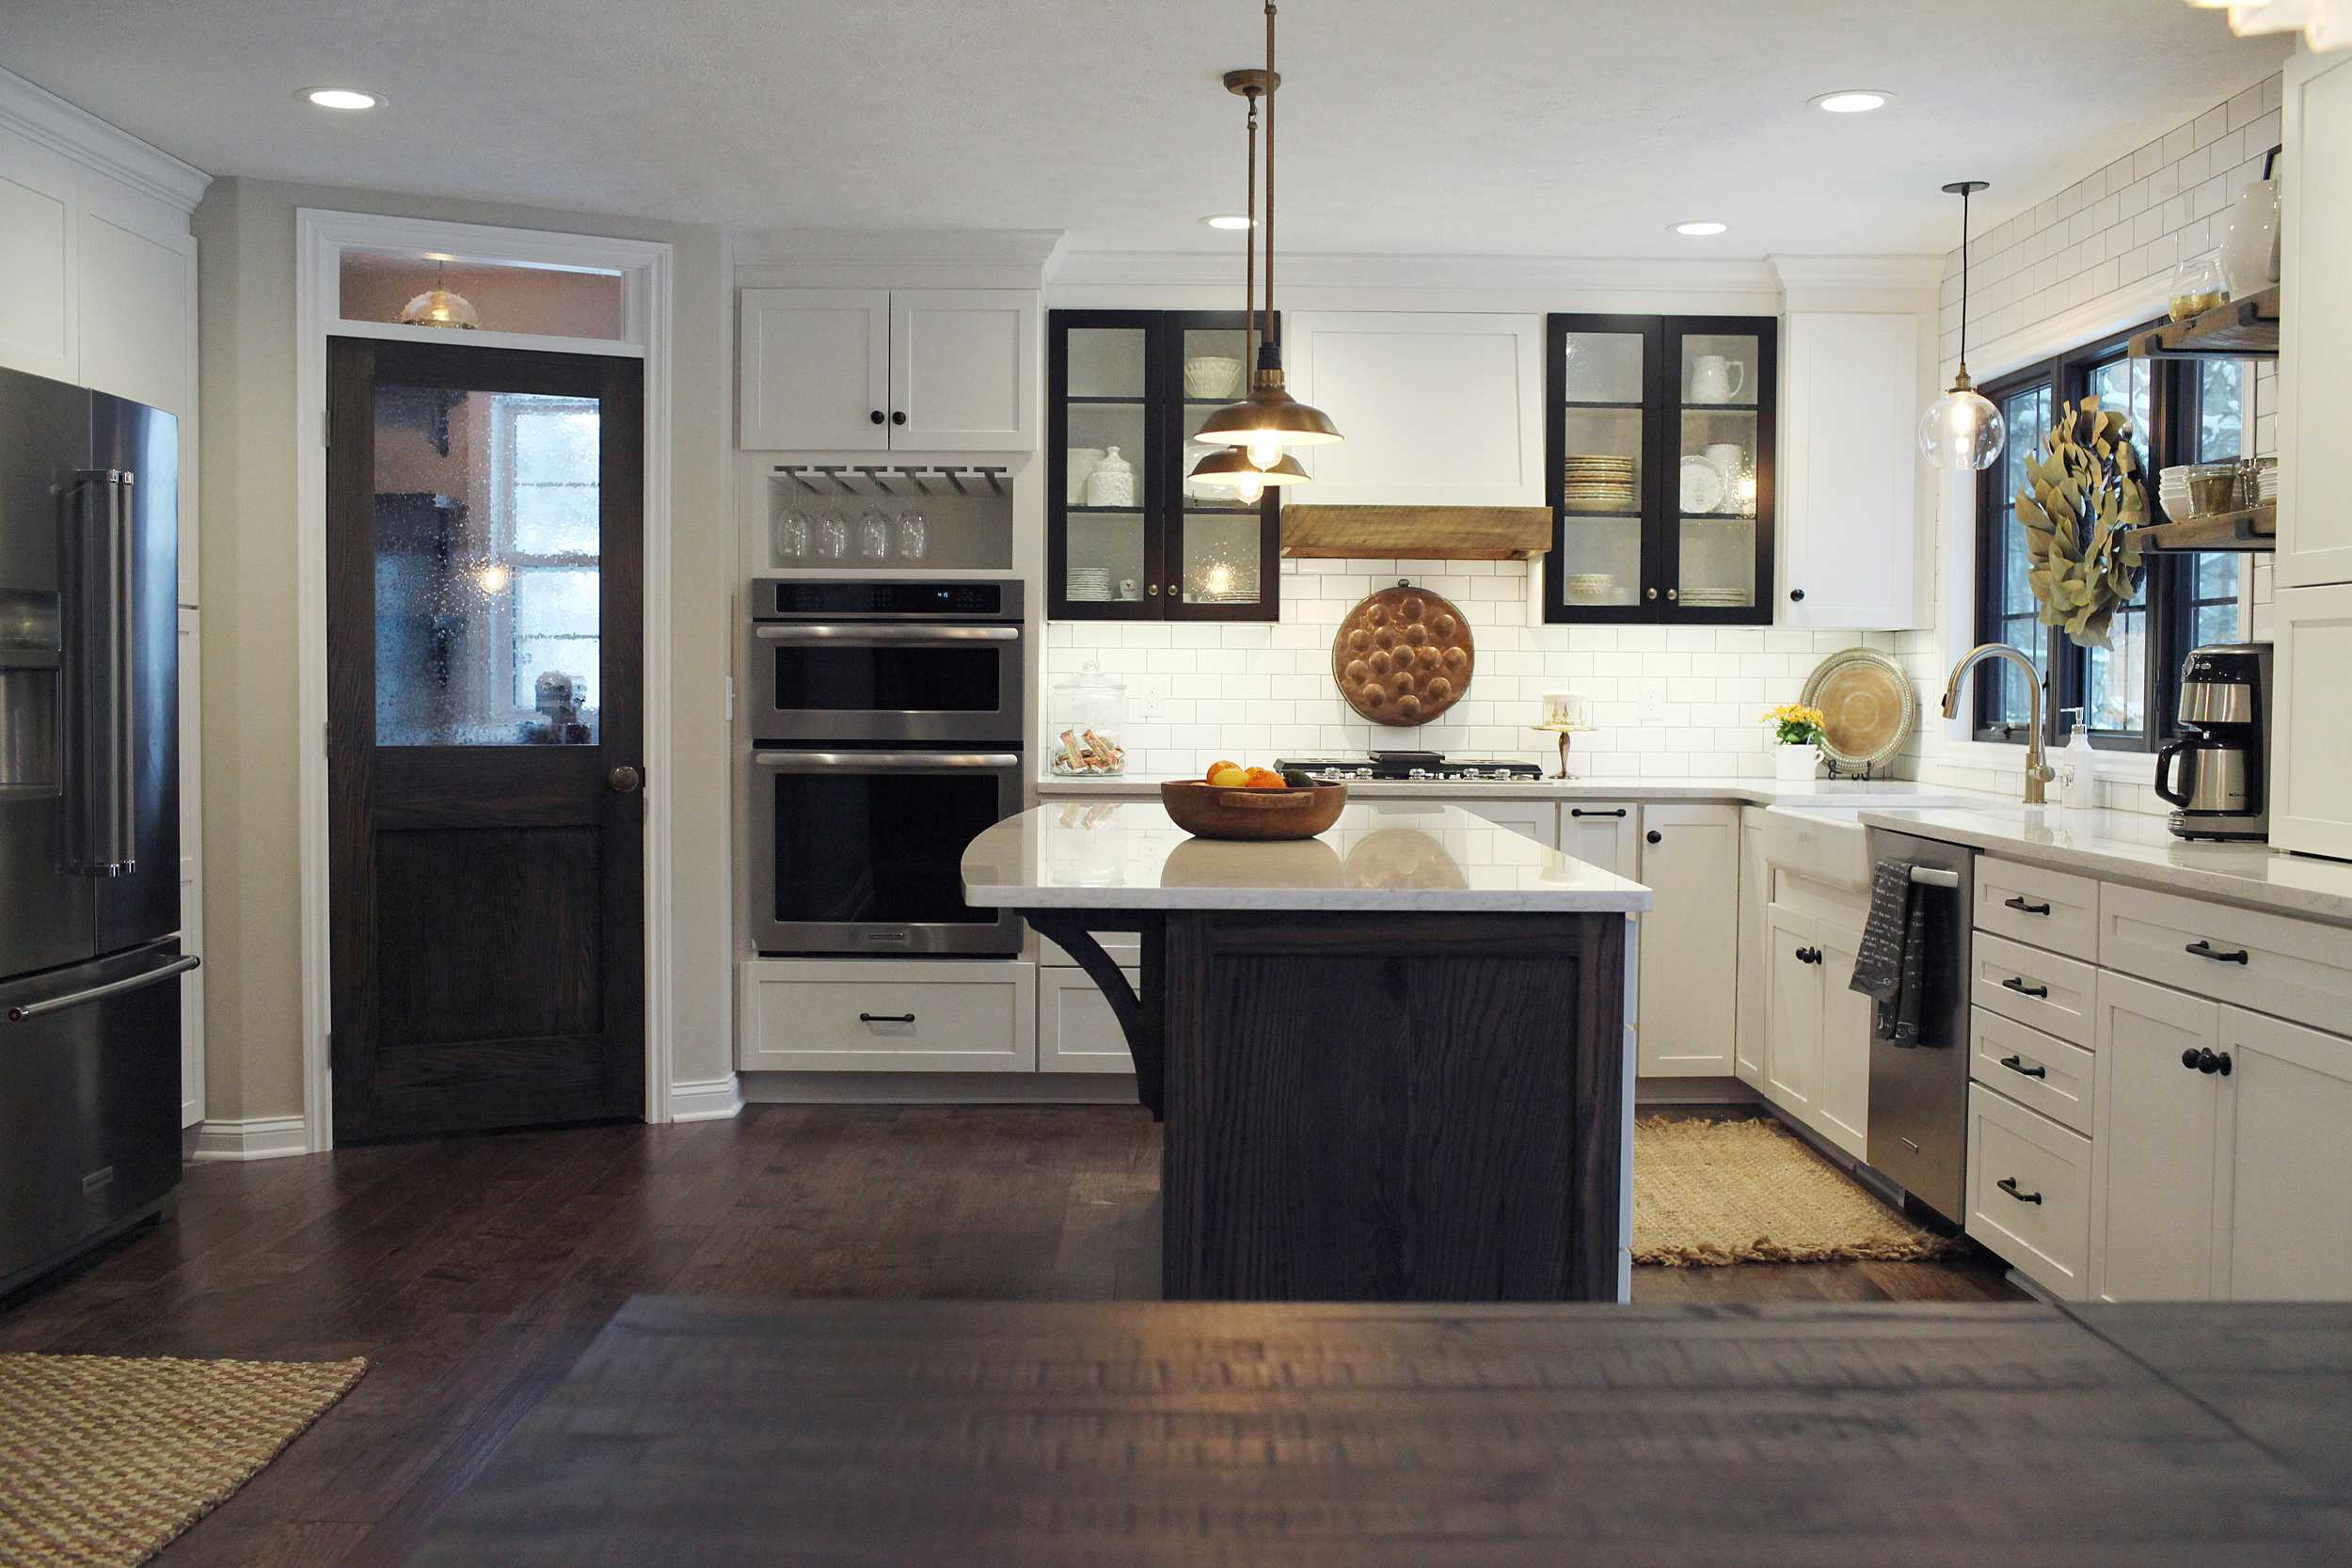 kitchen_remodel (5).jpg